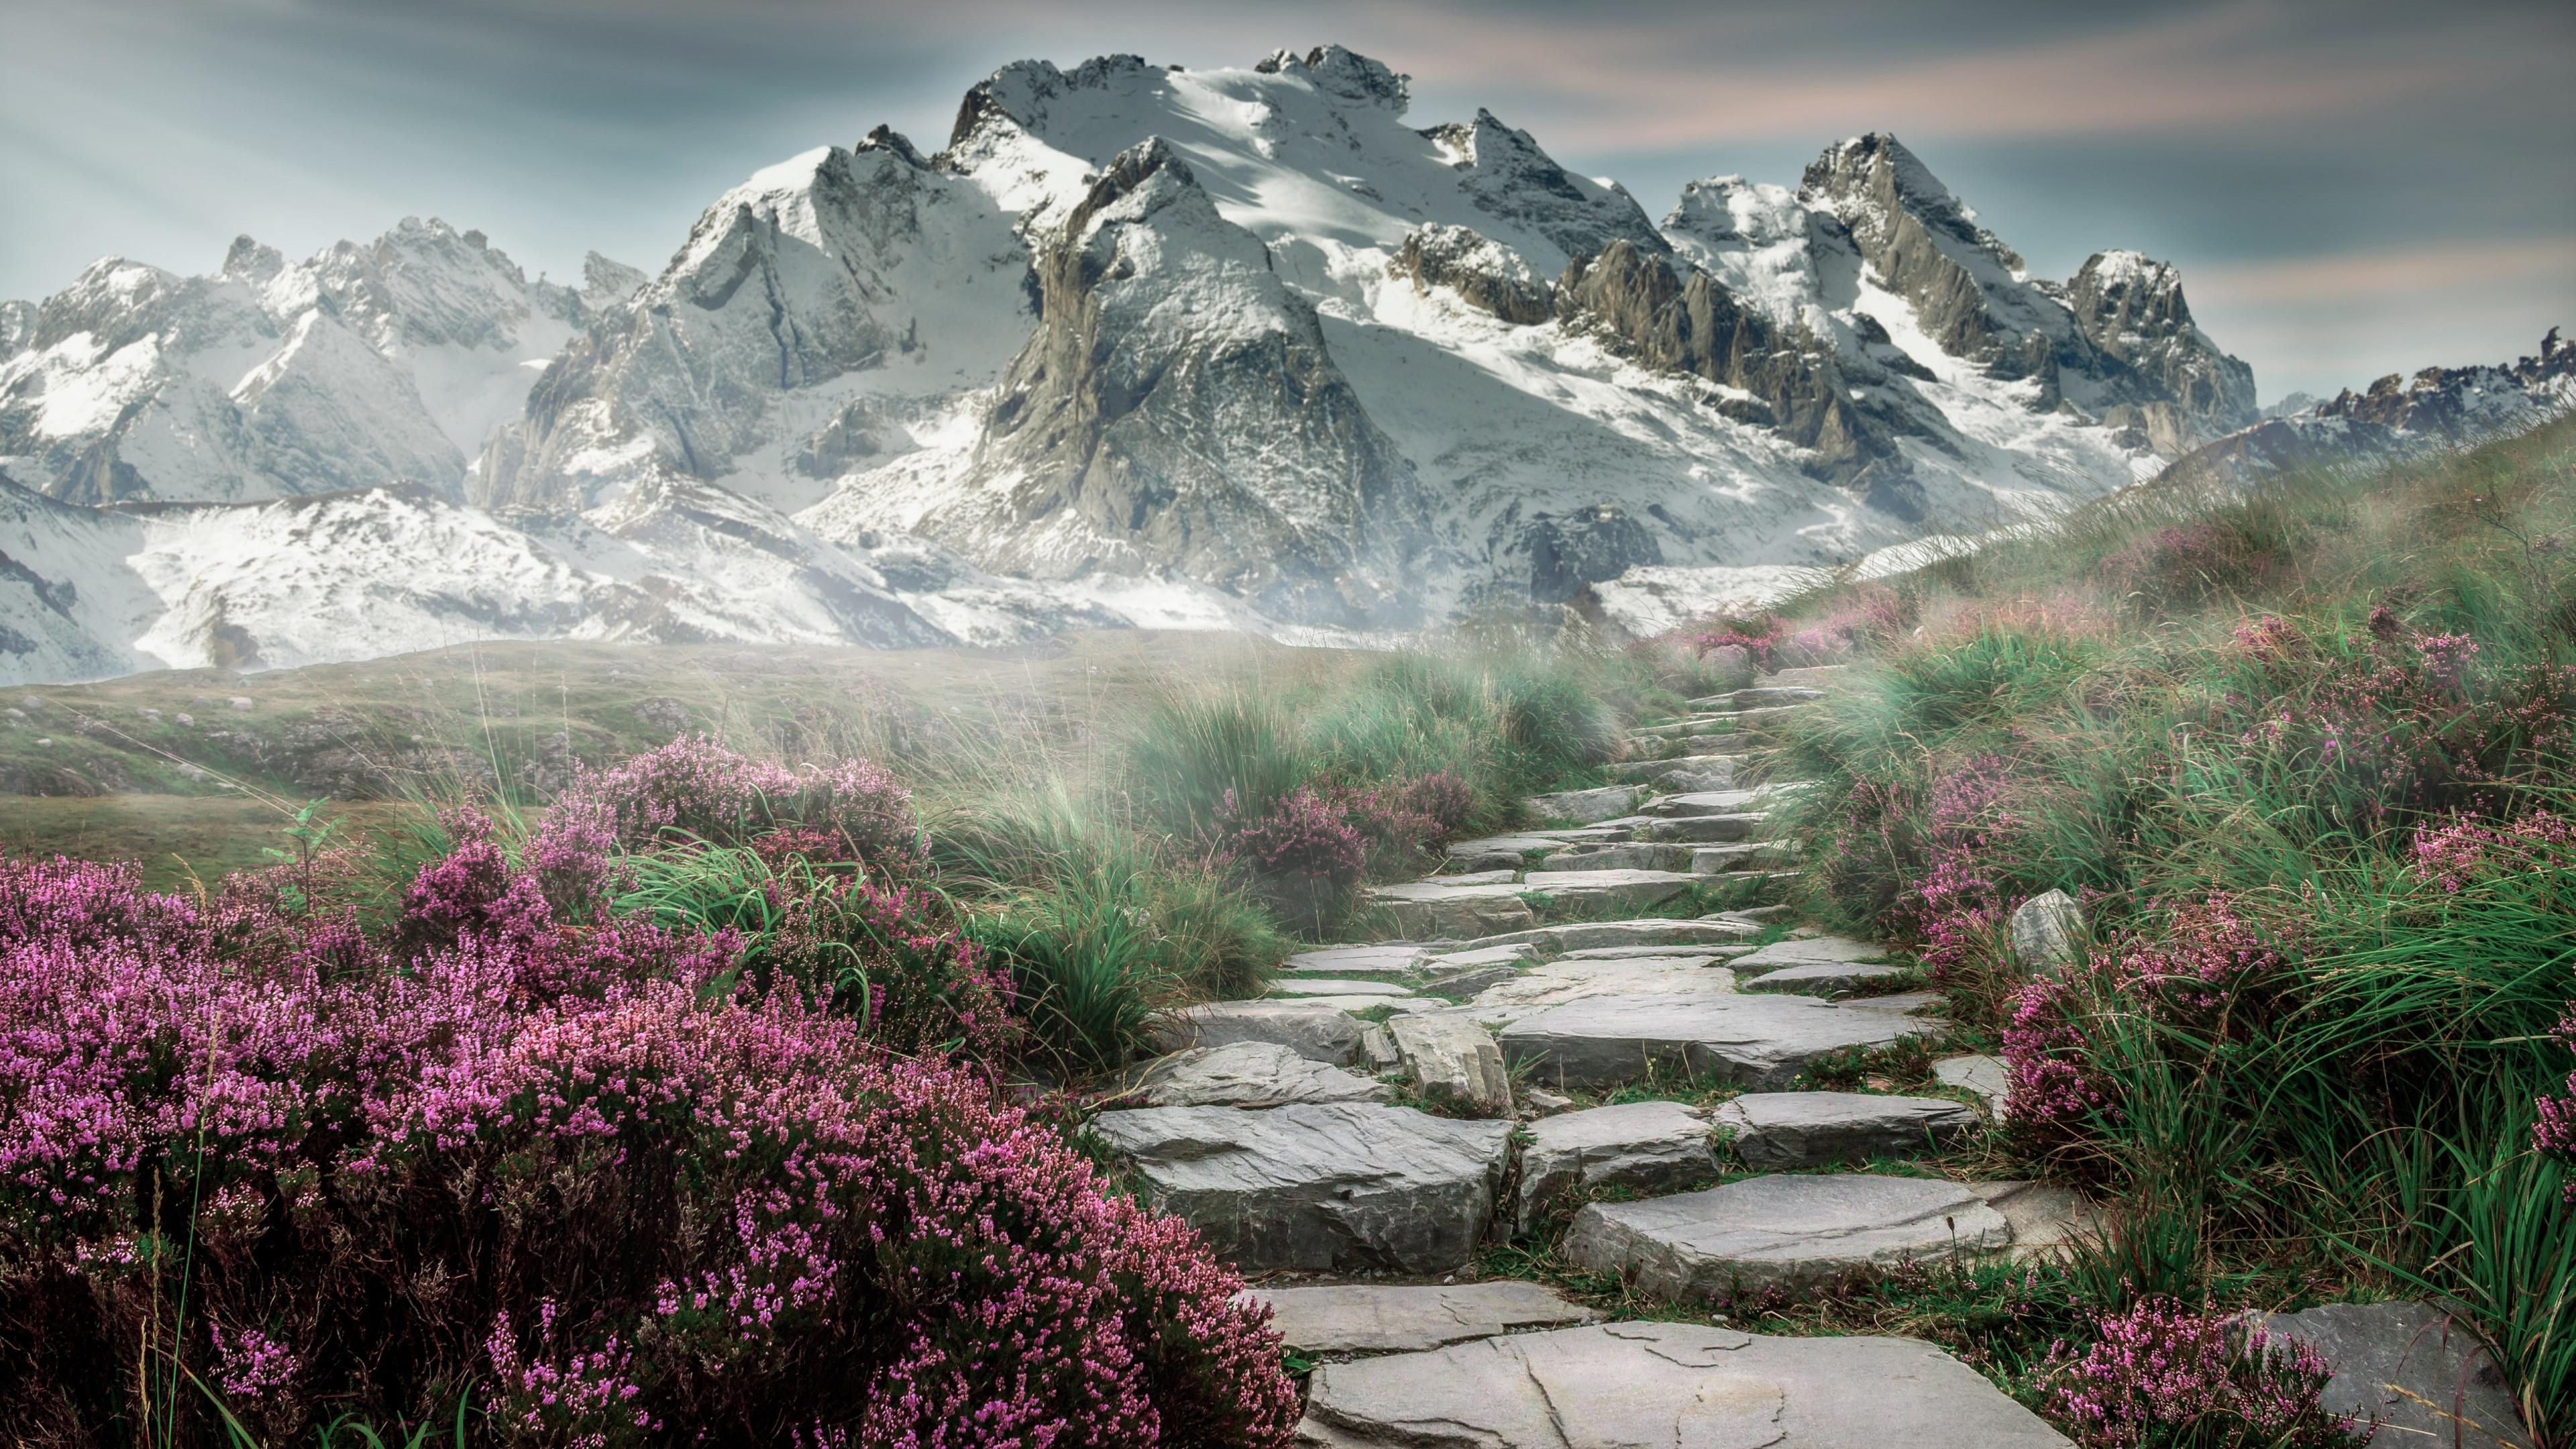 Download Wallpaper Surreal Mountain Landscape 3840x2160